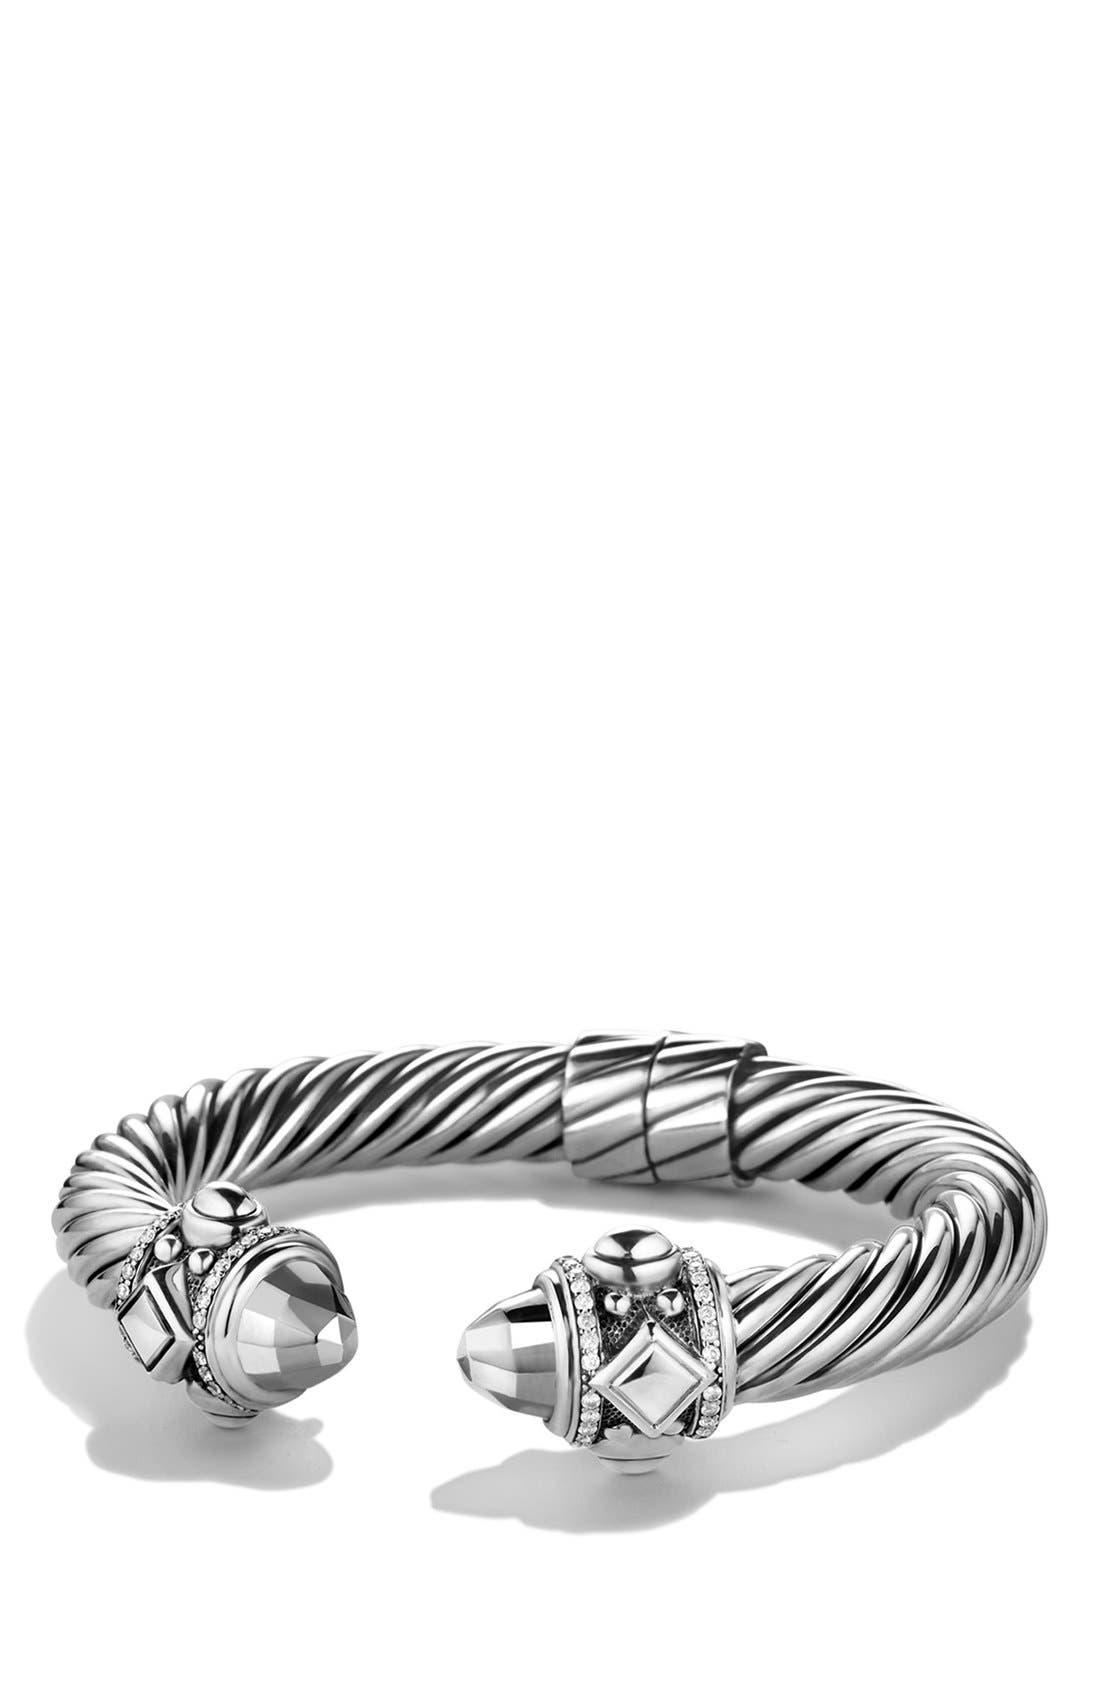 DAVID YURMAN Renaissance Bracelet with Black Diamonds